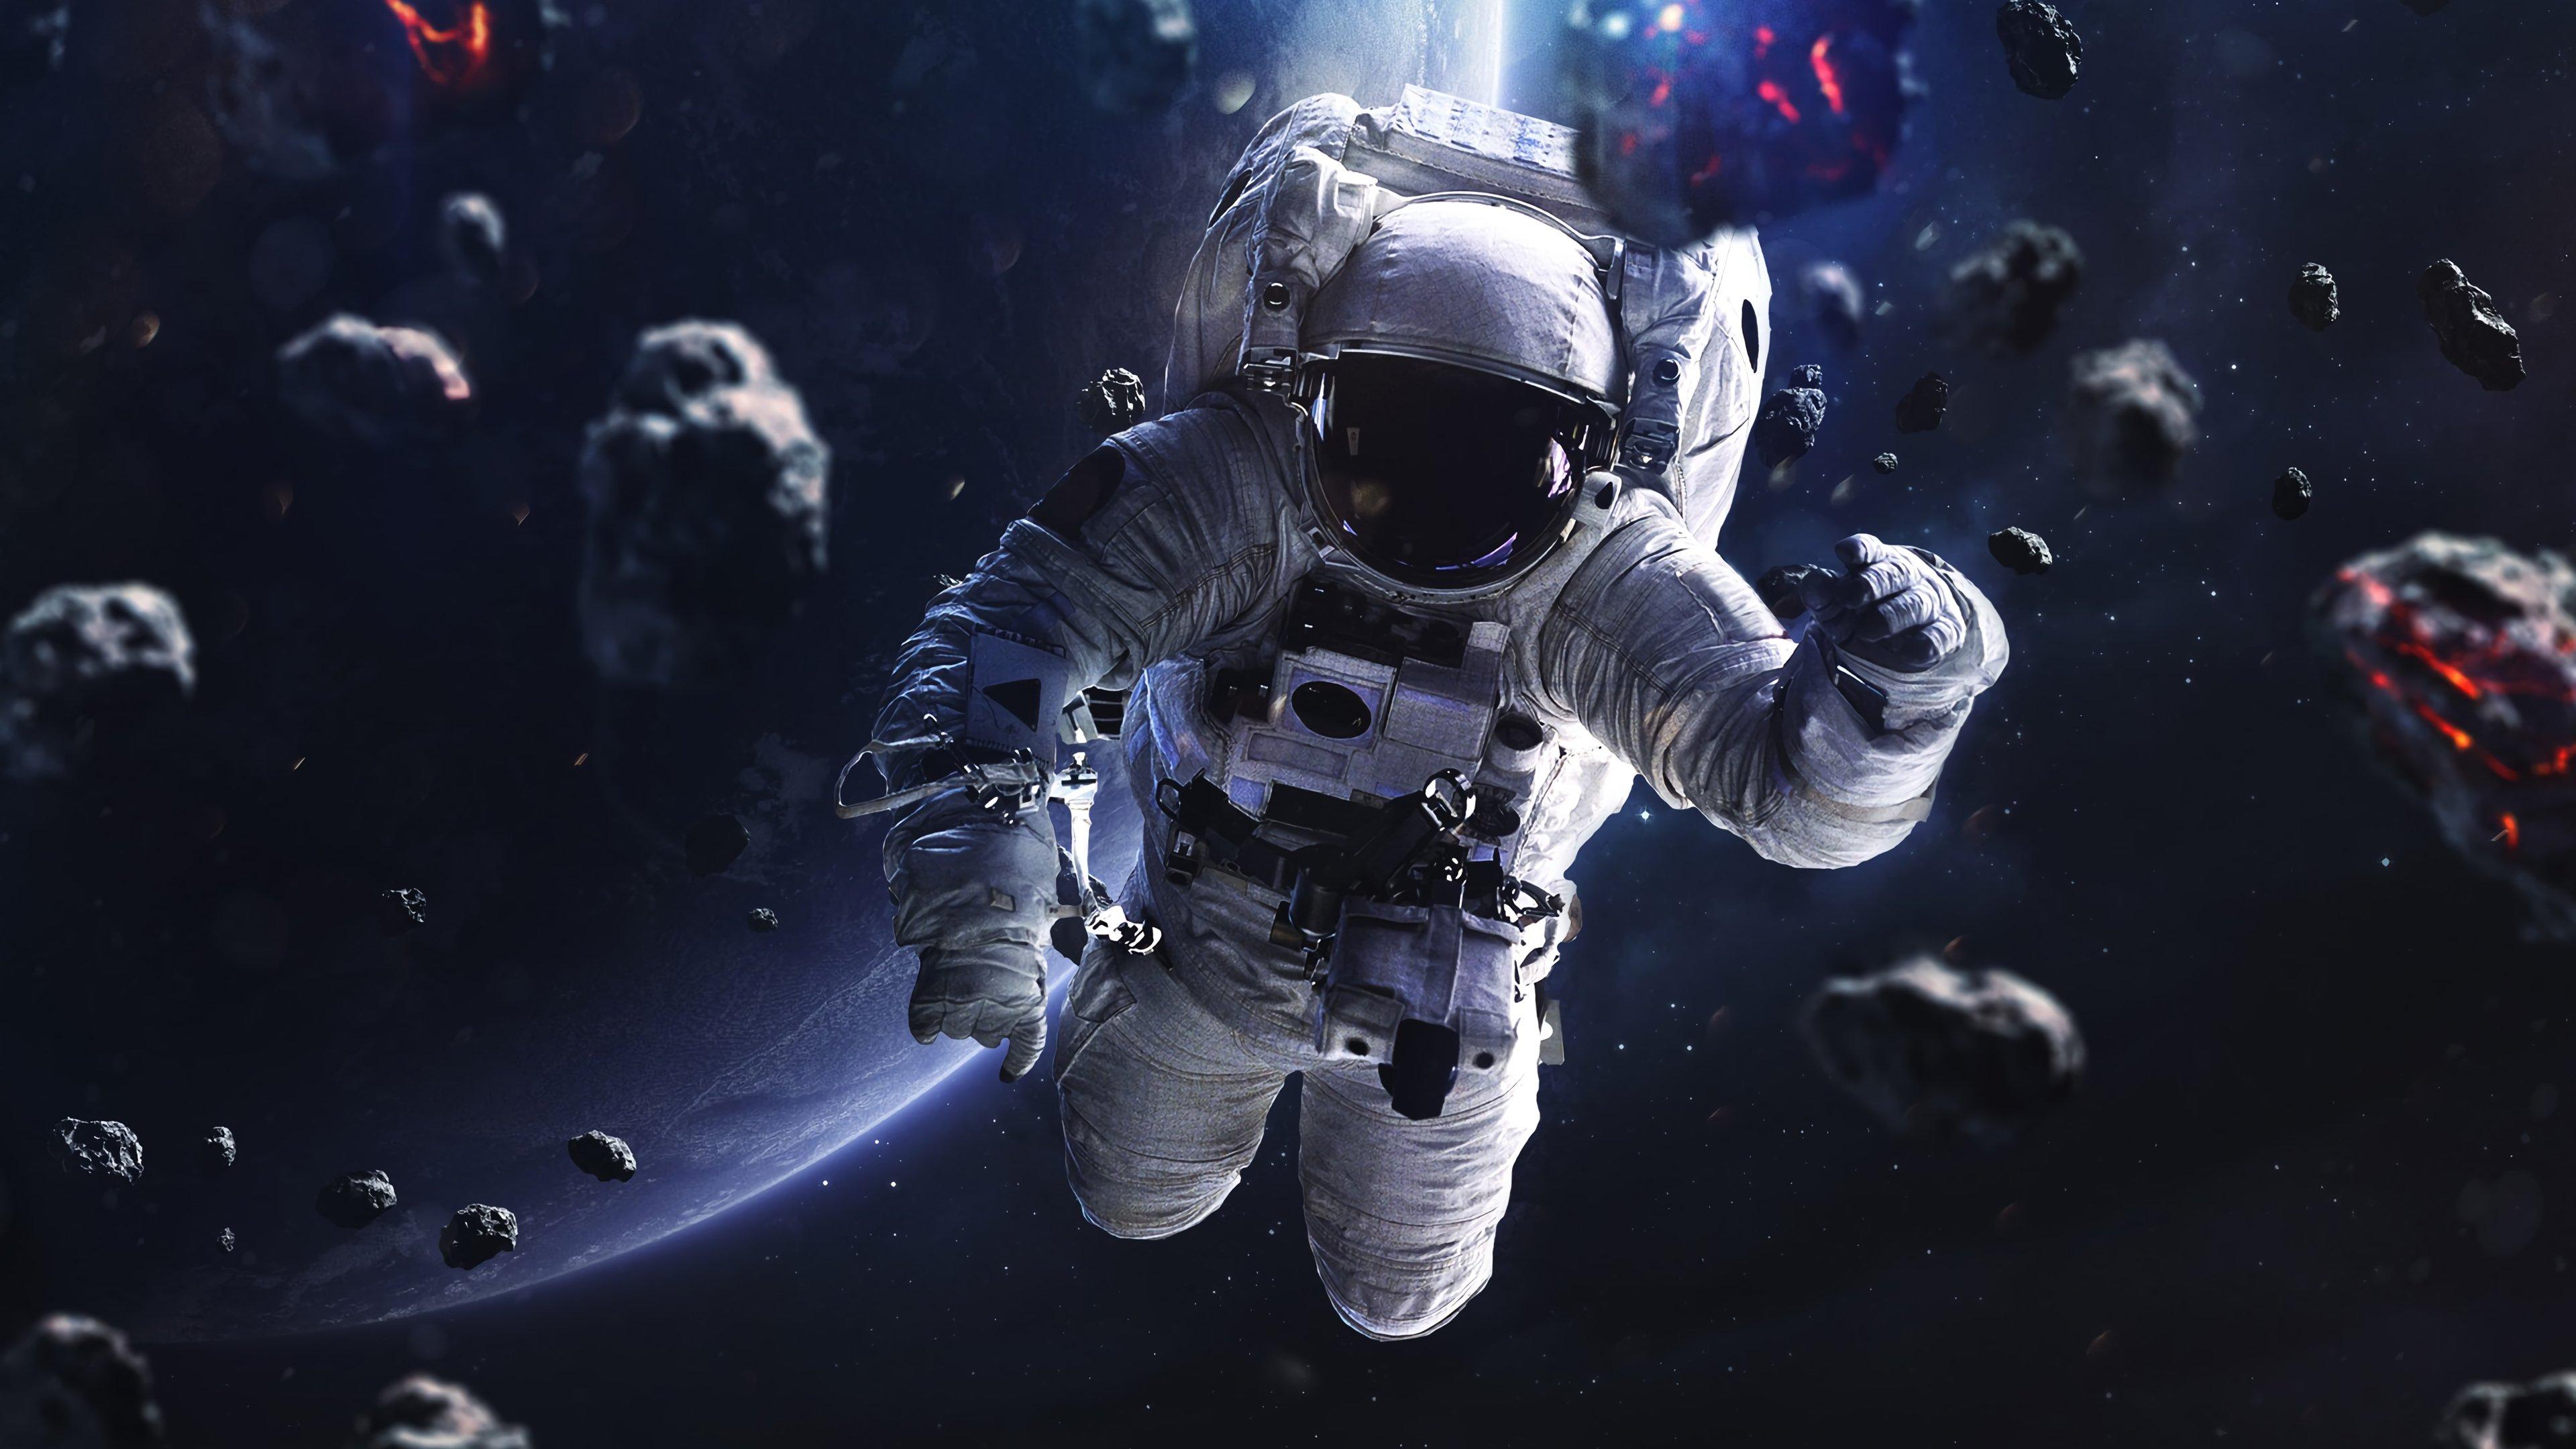 Wallpaper Astronaut floating around asteroids